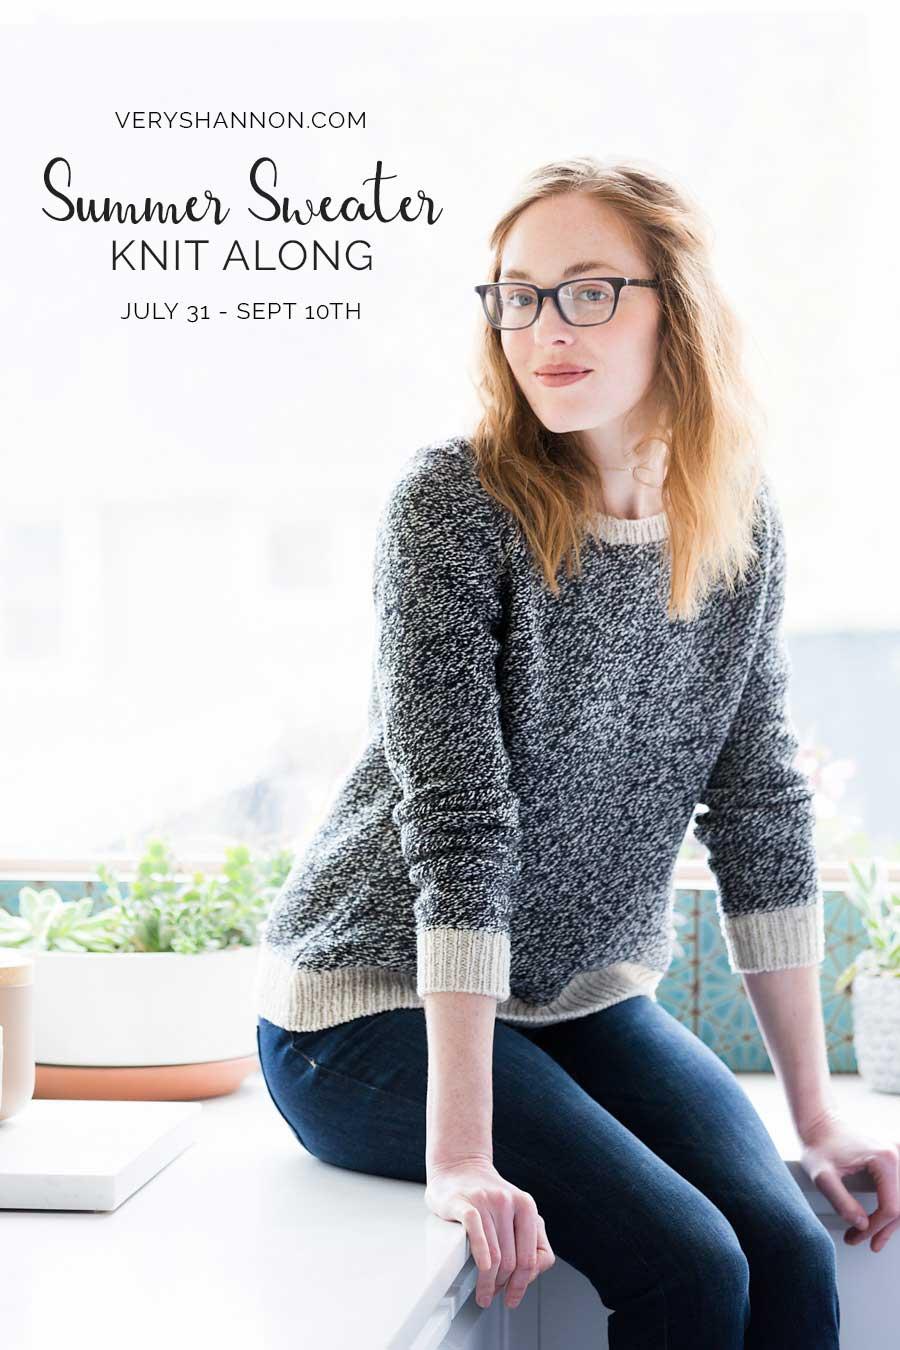 summer sweater knit along 2017 on veryshannon.com #sskal17